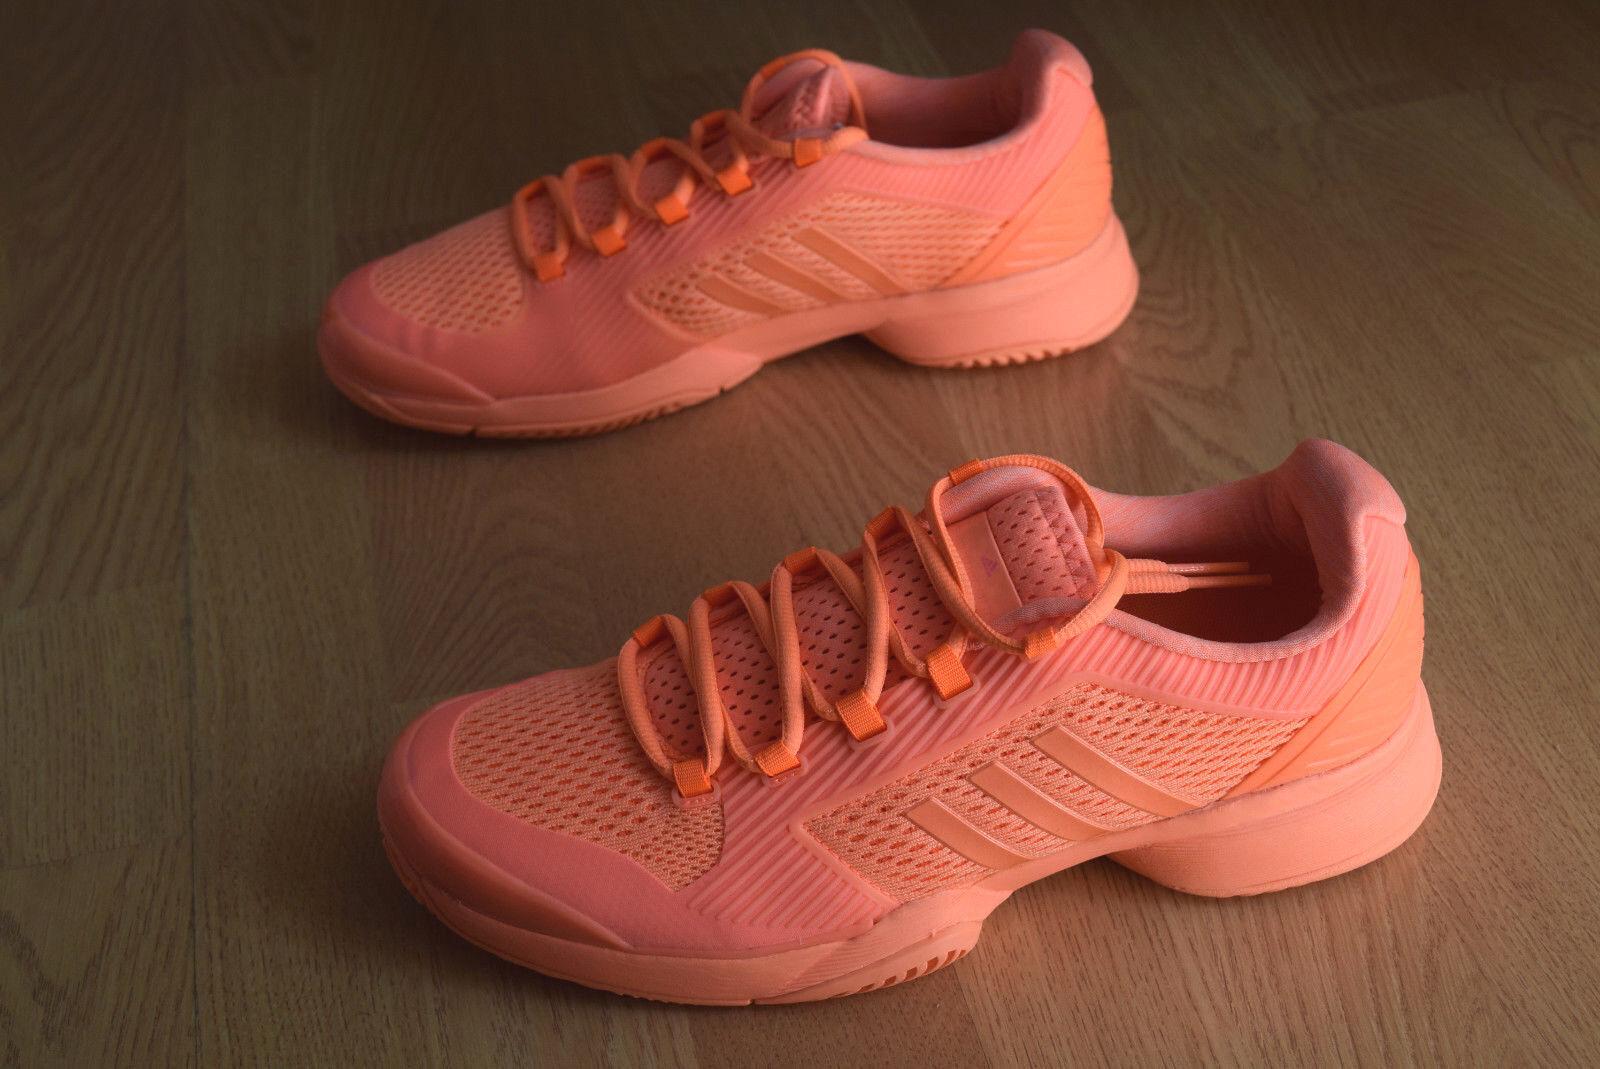 Adidas Stella Mccartney Barricade 2016 asmc asmc asmc 37 38 40,5 tenis s78495  minorista de fitness